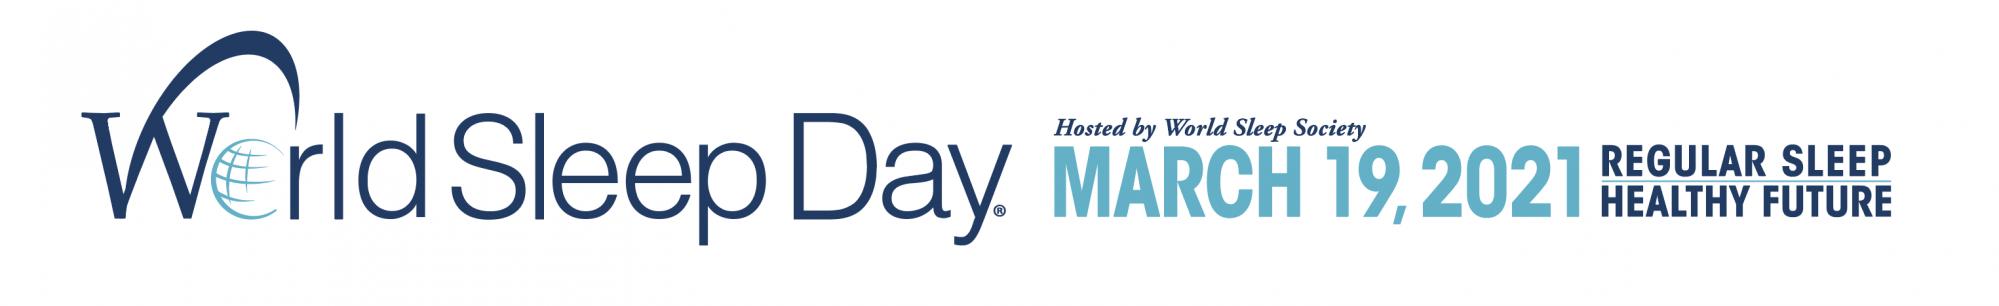 World Sleep Day March 19, 2021